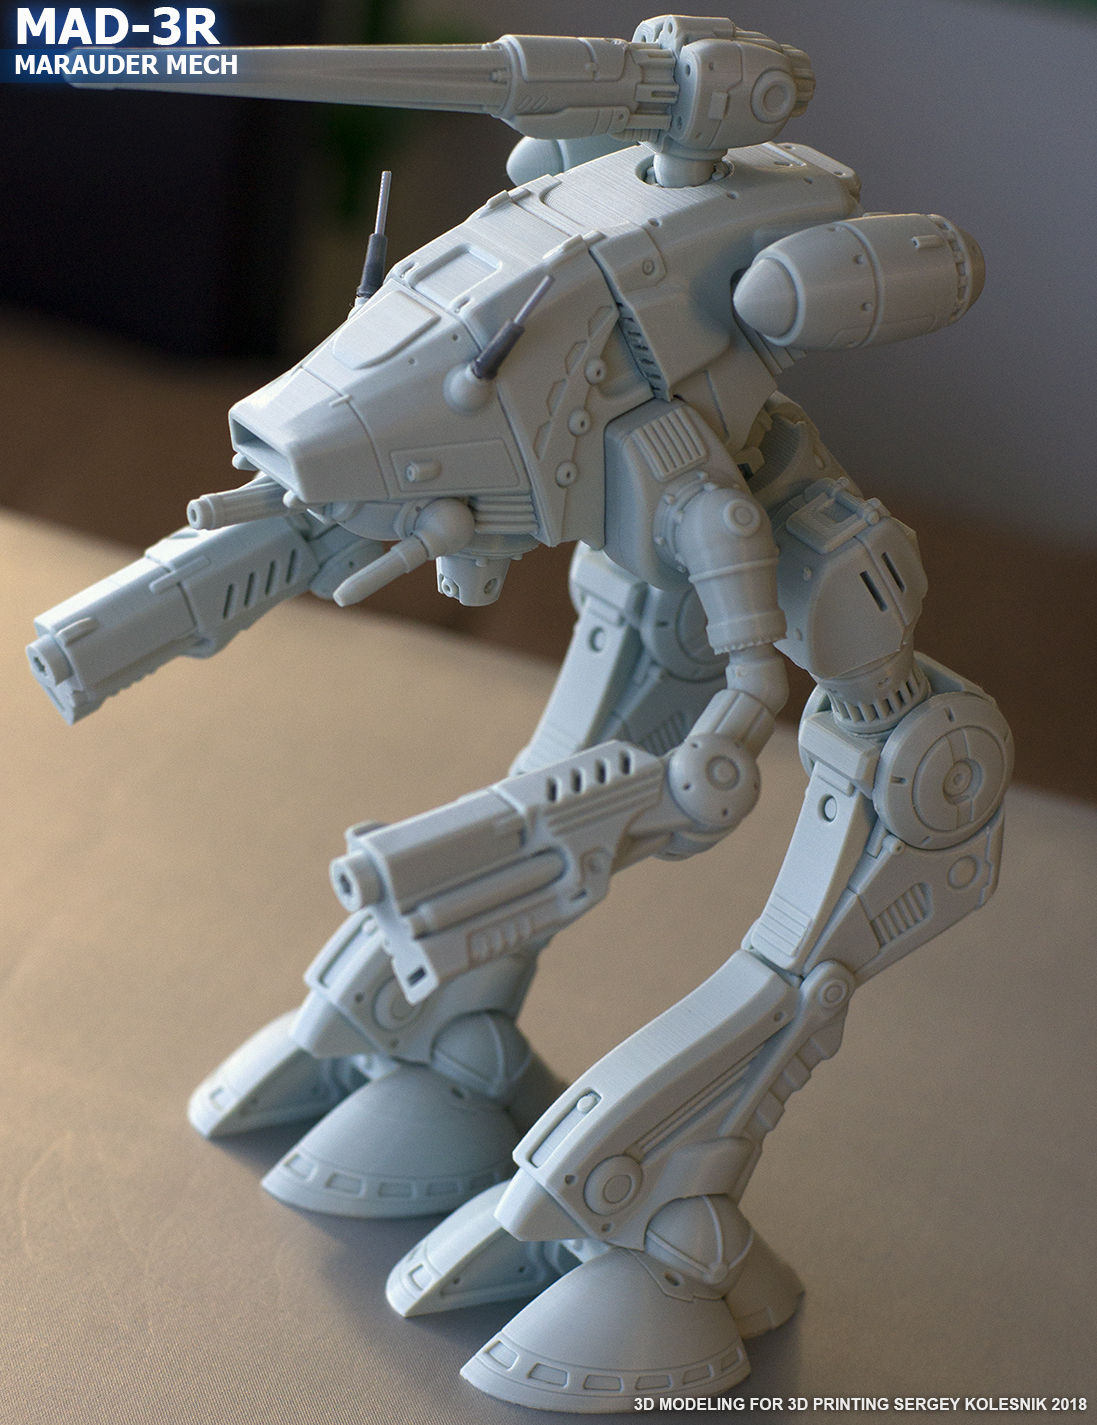 Original MAD-3R Marauder Mech Autodesk Online Gallery